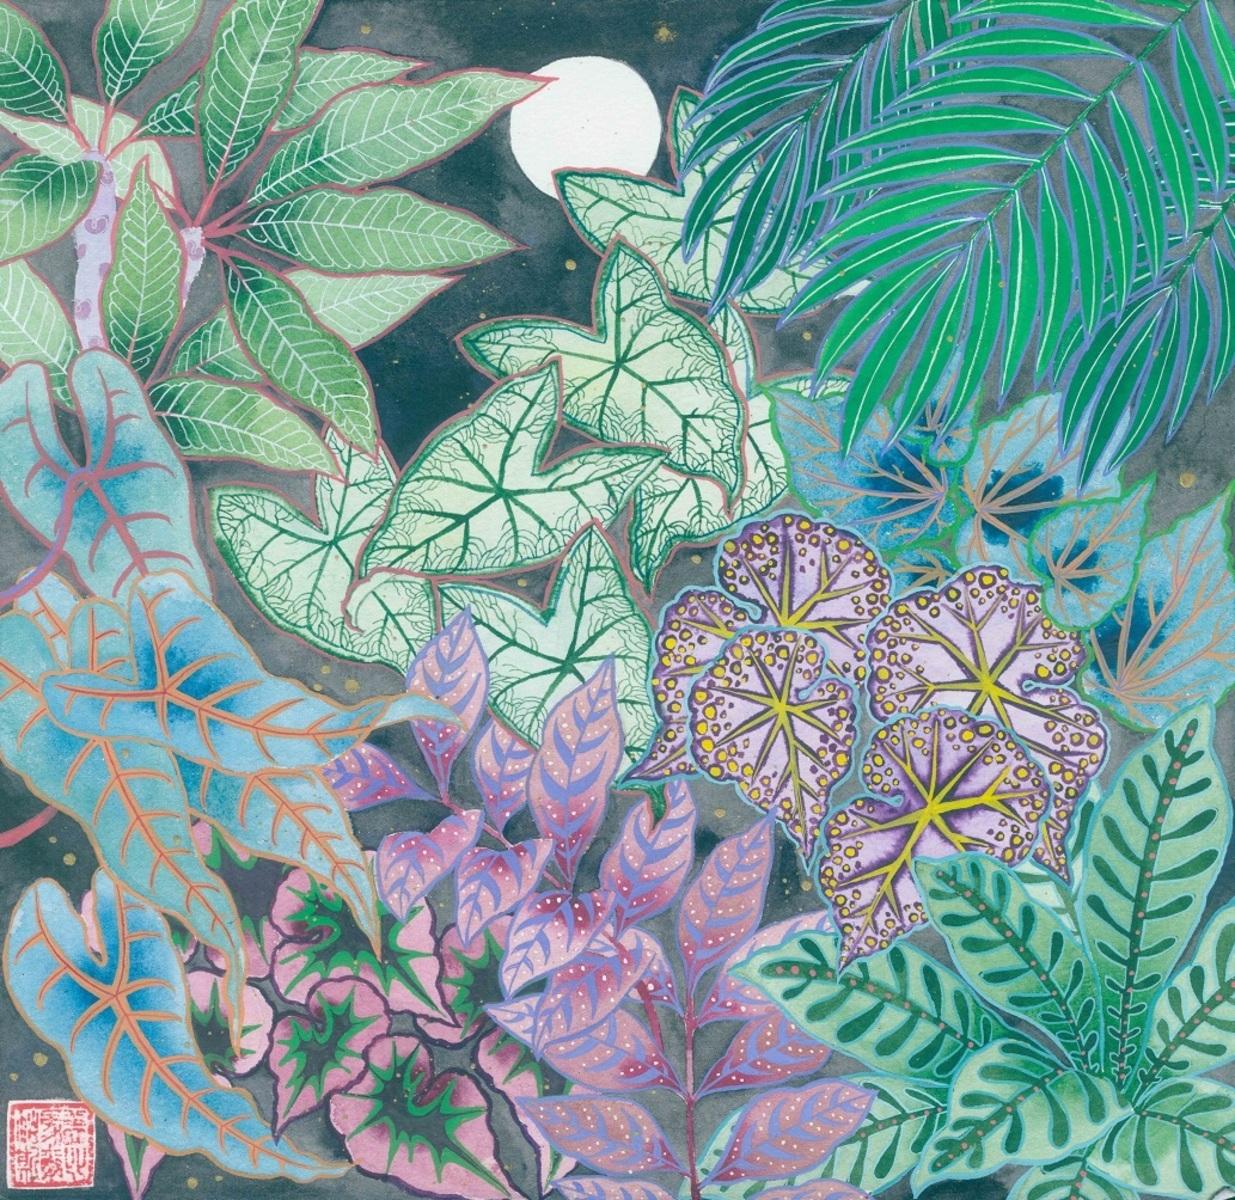 Night Jungle - Unframed